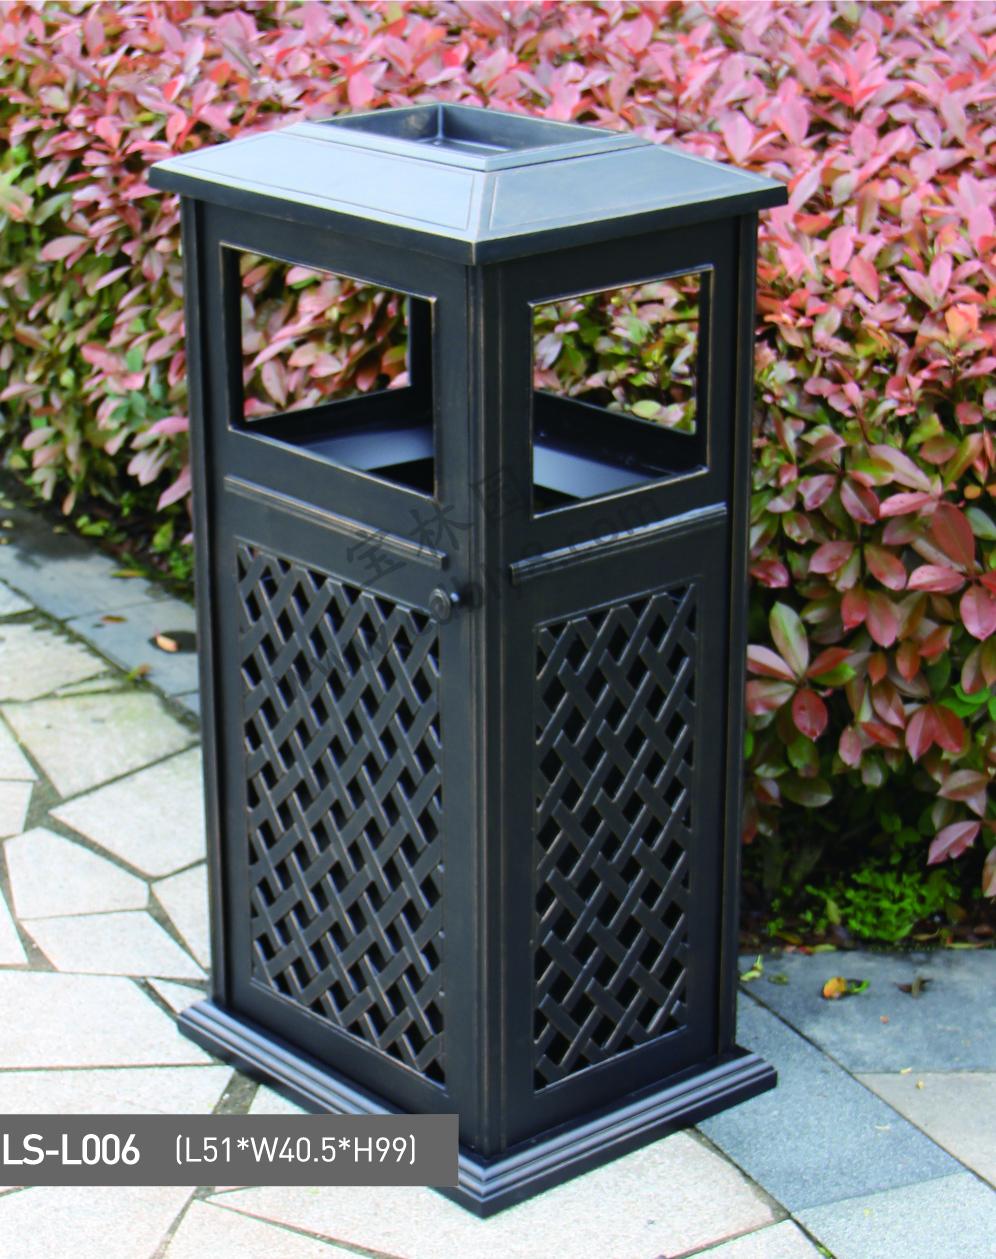 BB1-036全钢单桶垃圾桶